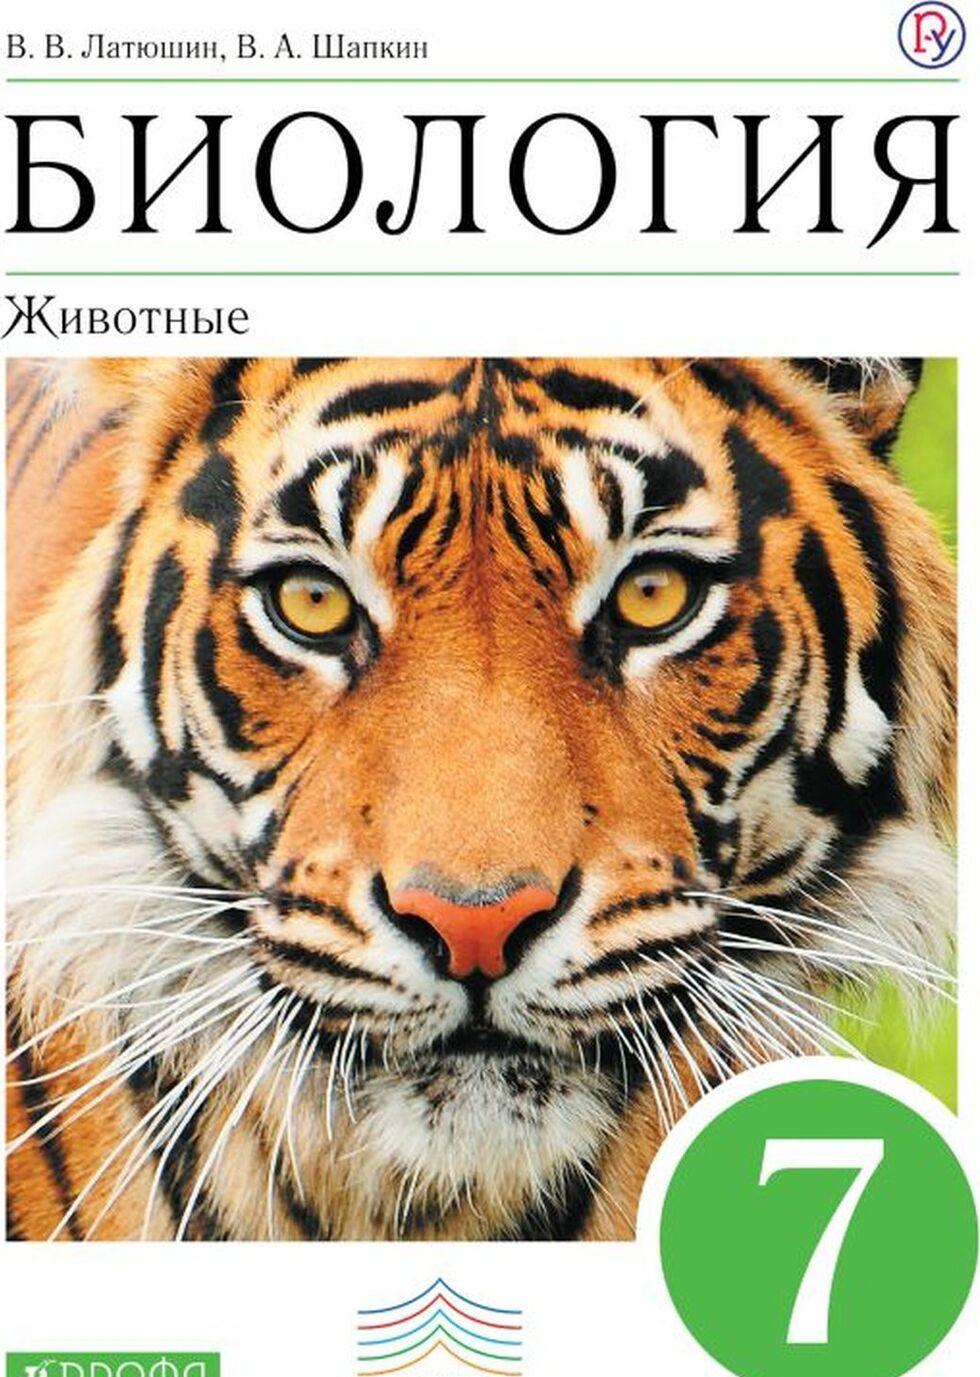 Biologija. Zhivotnye. 7 klass. Uchebnik | Latjushin Vitalij Viktorovich, Shapkin Vladimir Alekseevich